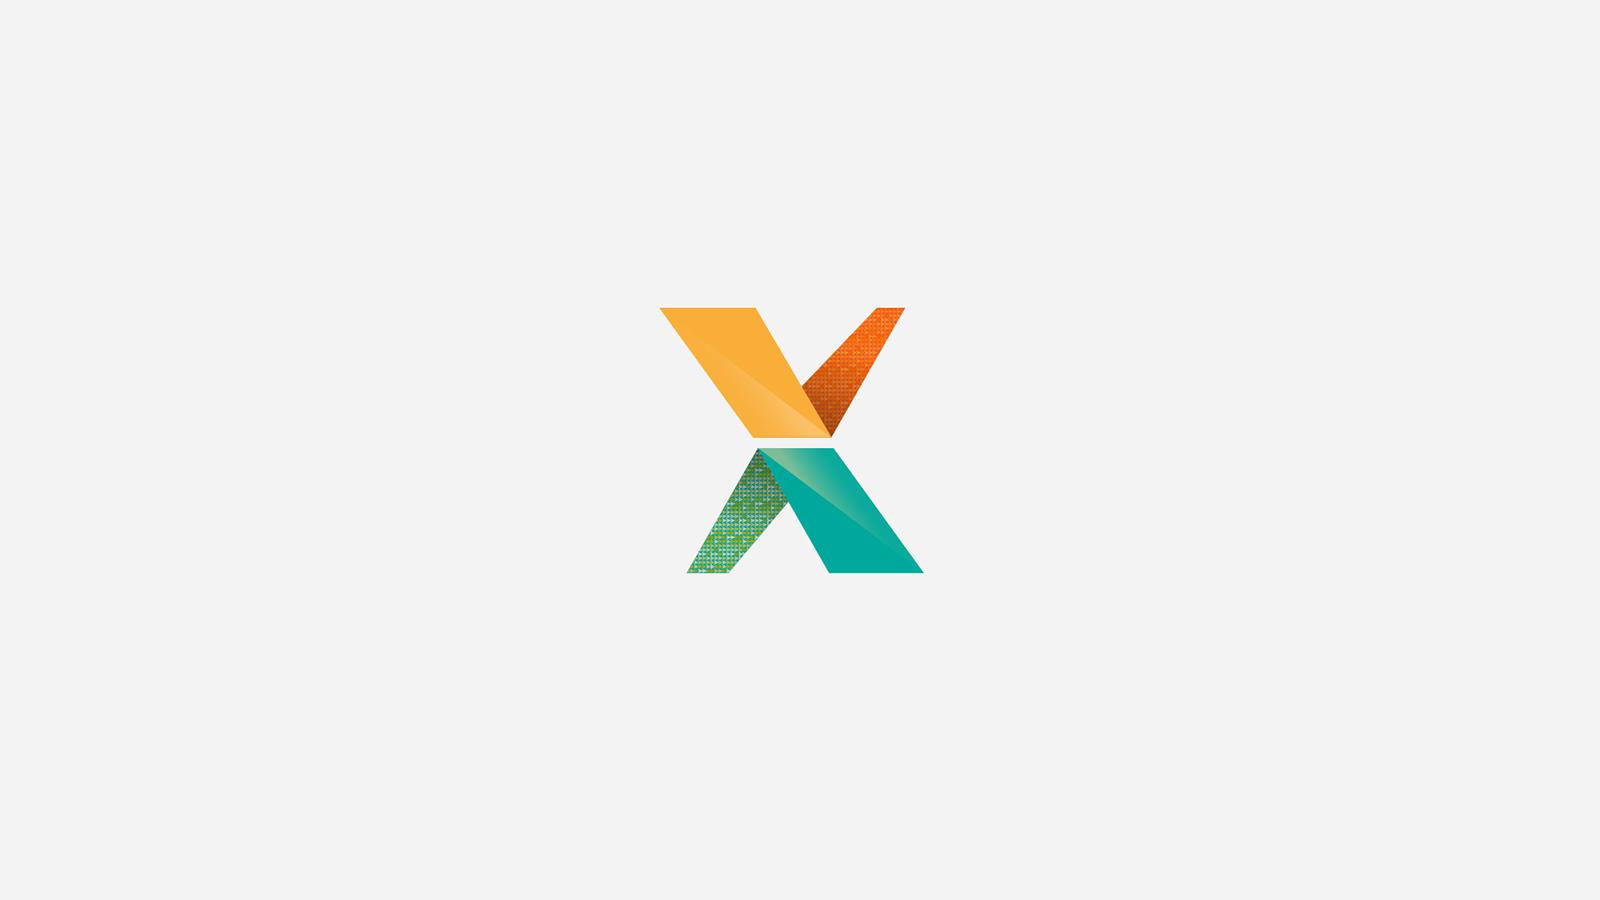 Logo design curtains company עיצוב לוגו לחברת ייצור וילונות